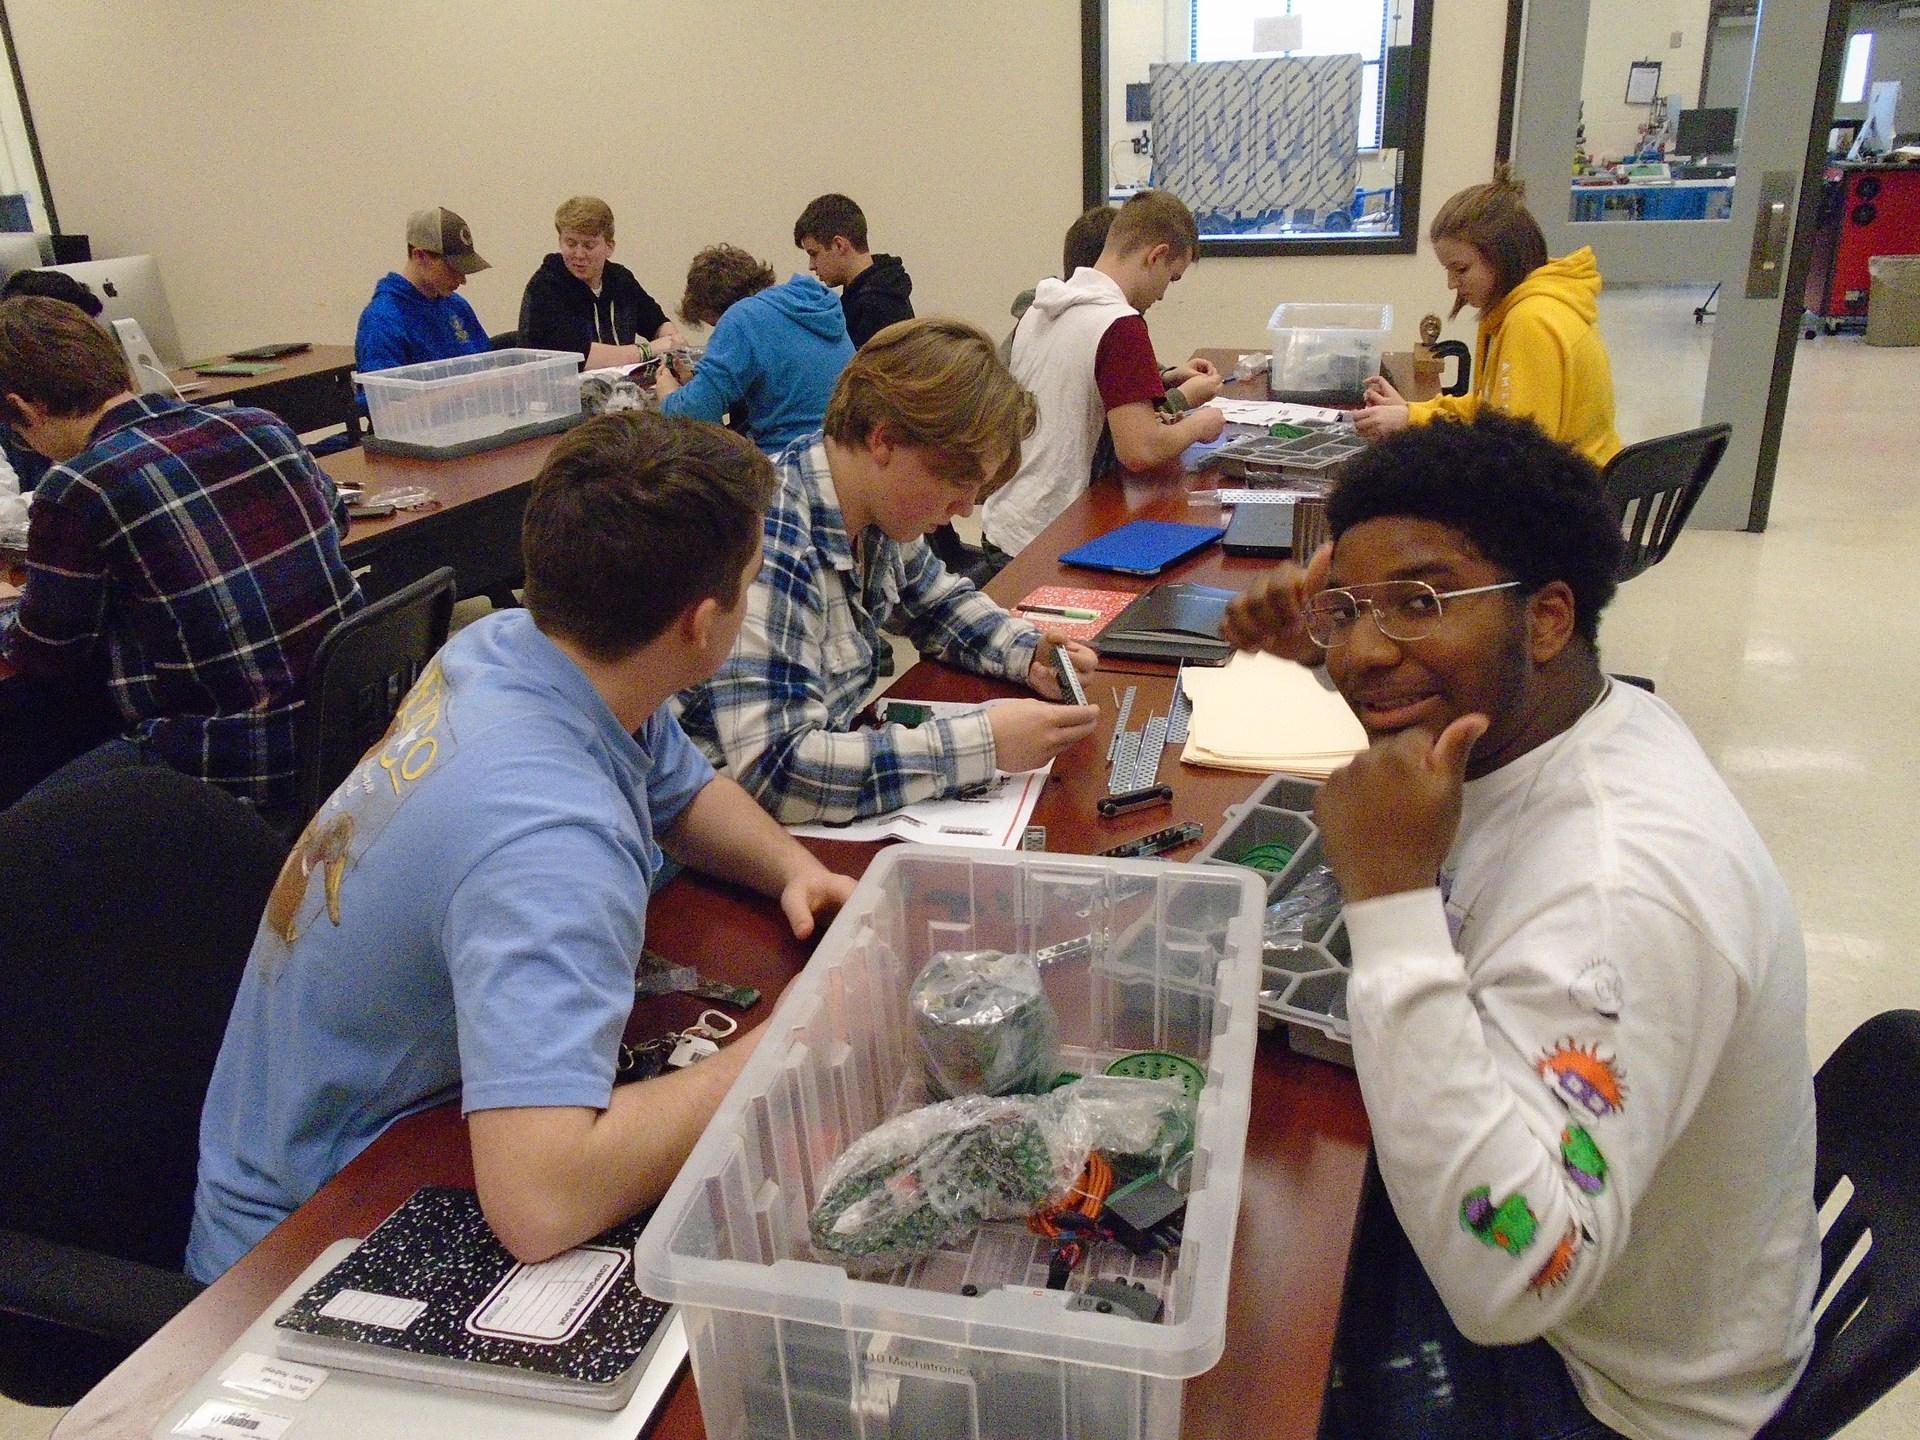 Students love Engineering!